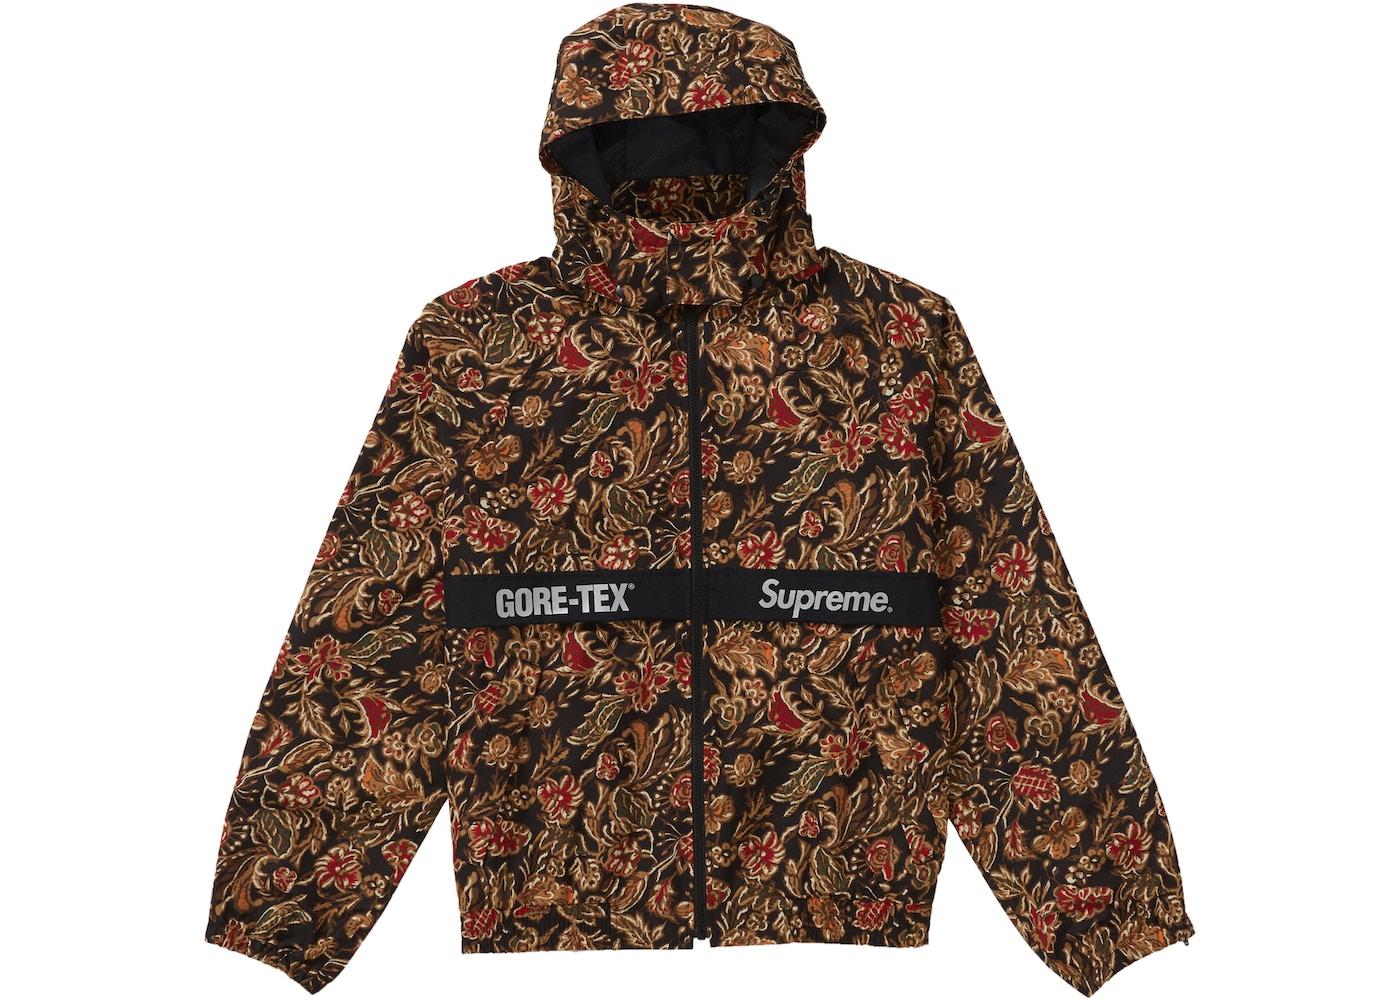 ac5309a5 Supreme GORE-TEX Court Jacket Flower Print - FW18